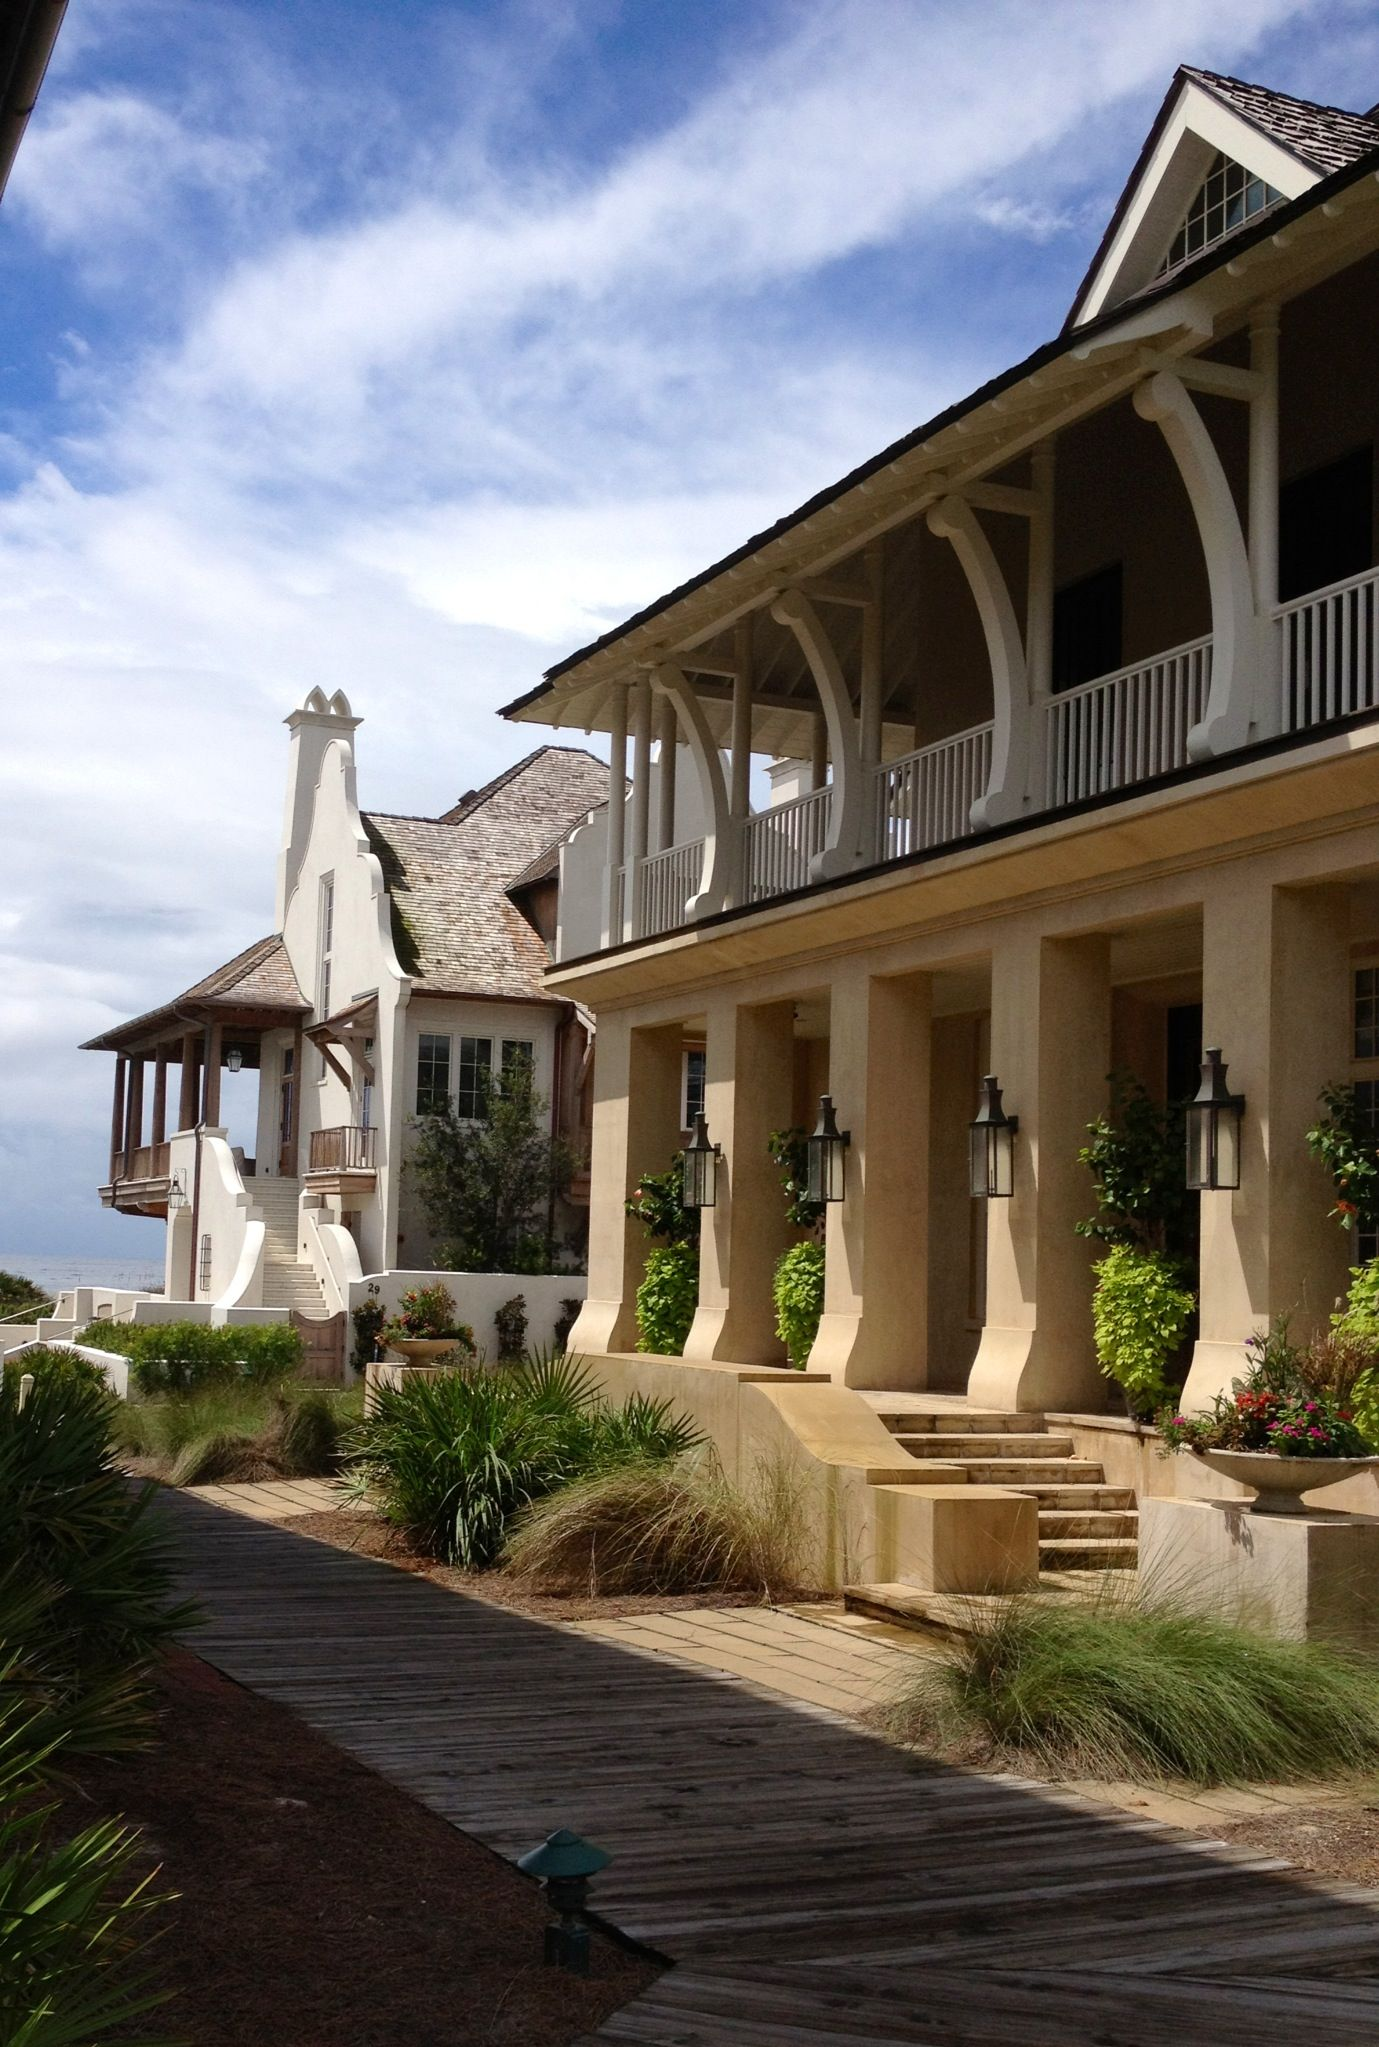 architectural wonderland on 30a beach beach house decor rh pinterest com